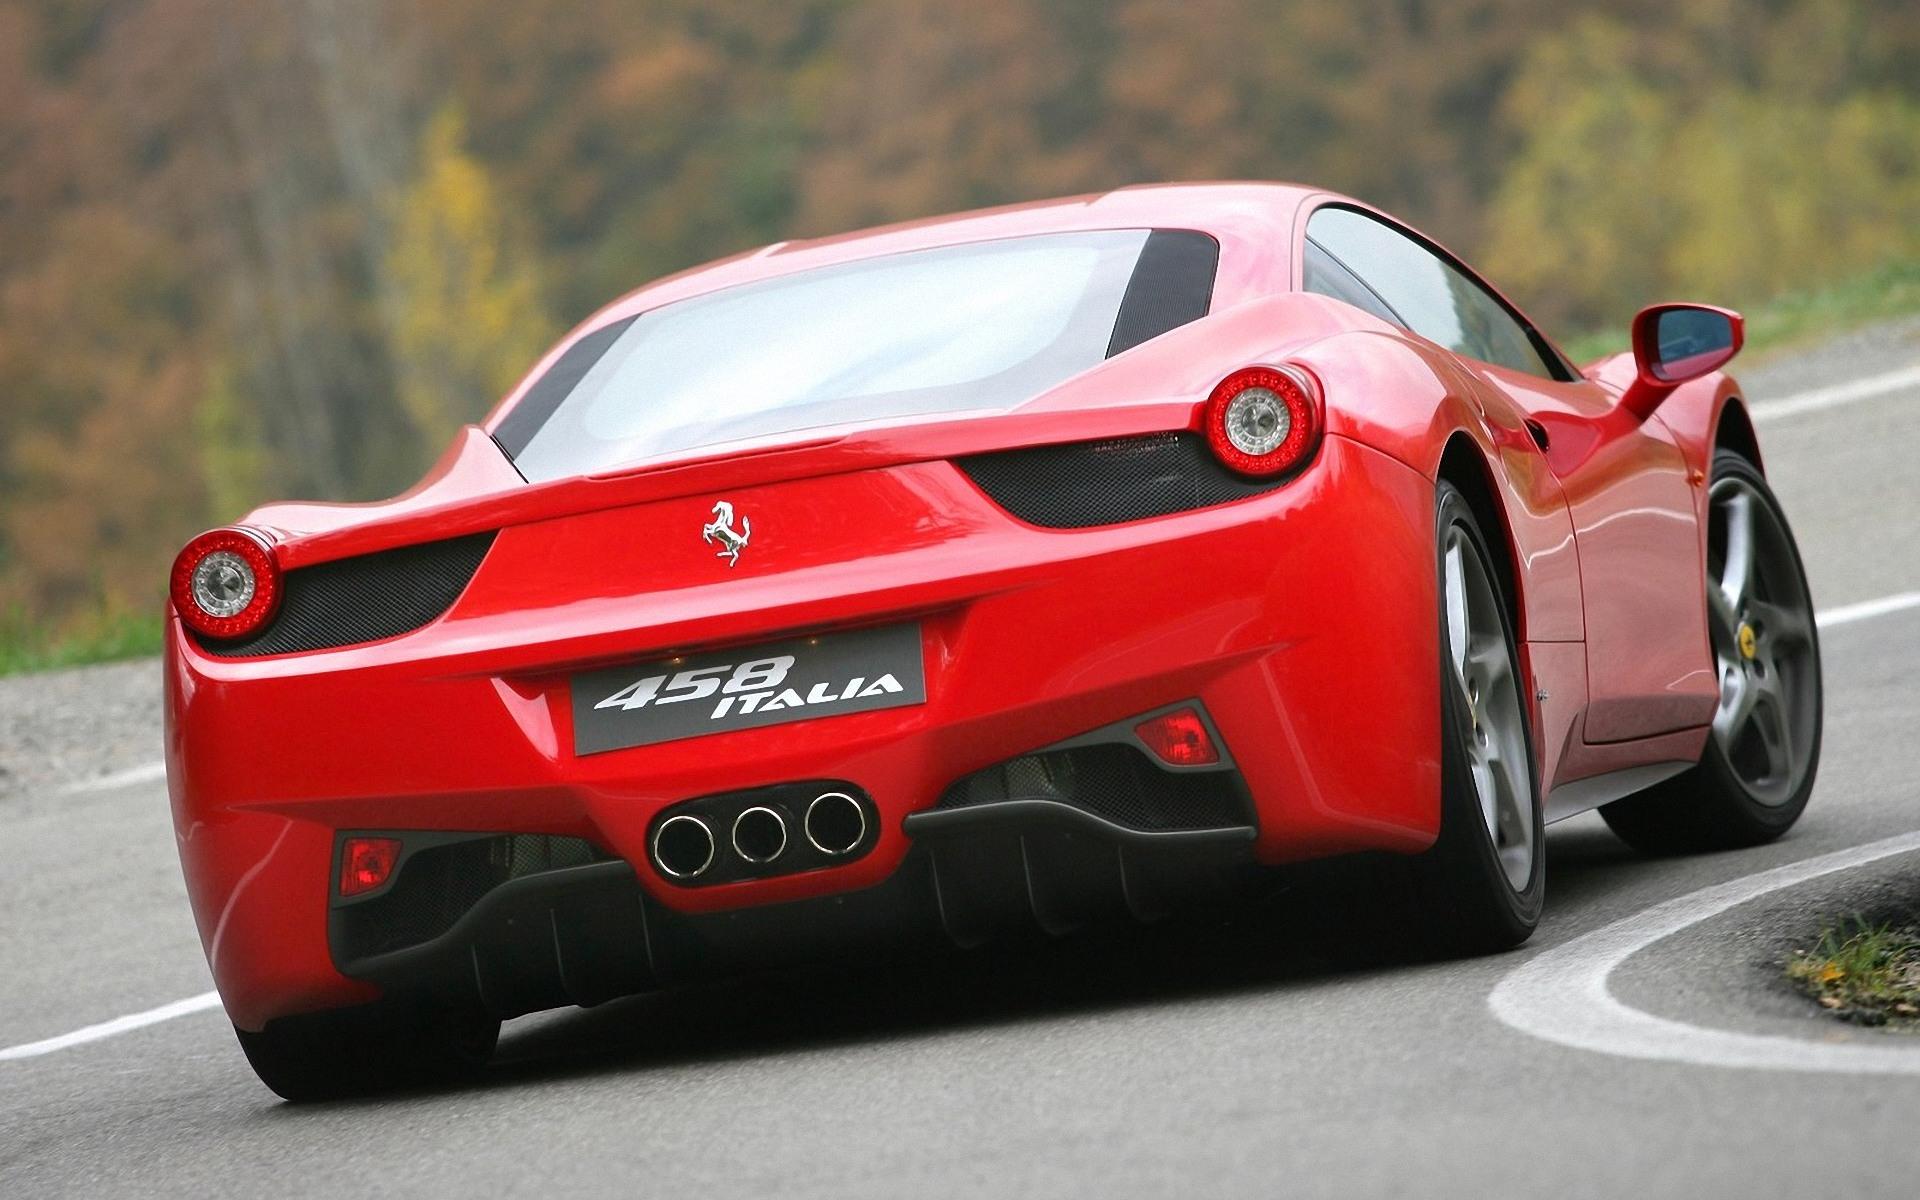 Ferrari 458 HD Wallpaper Background